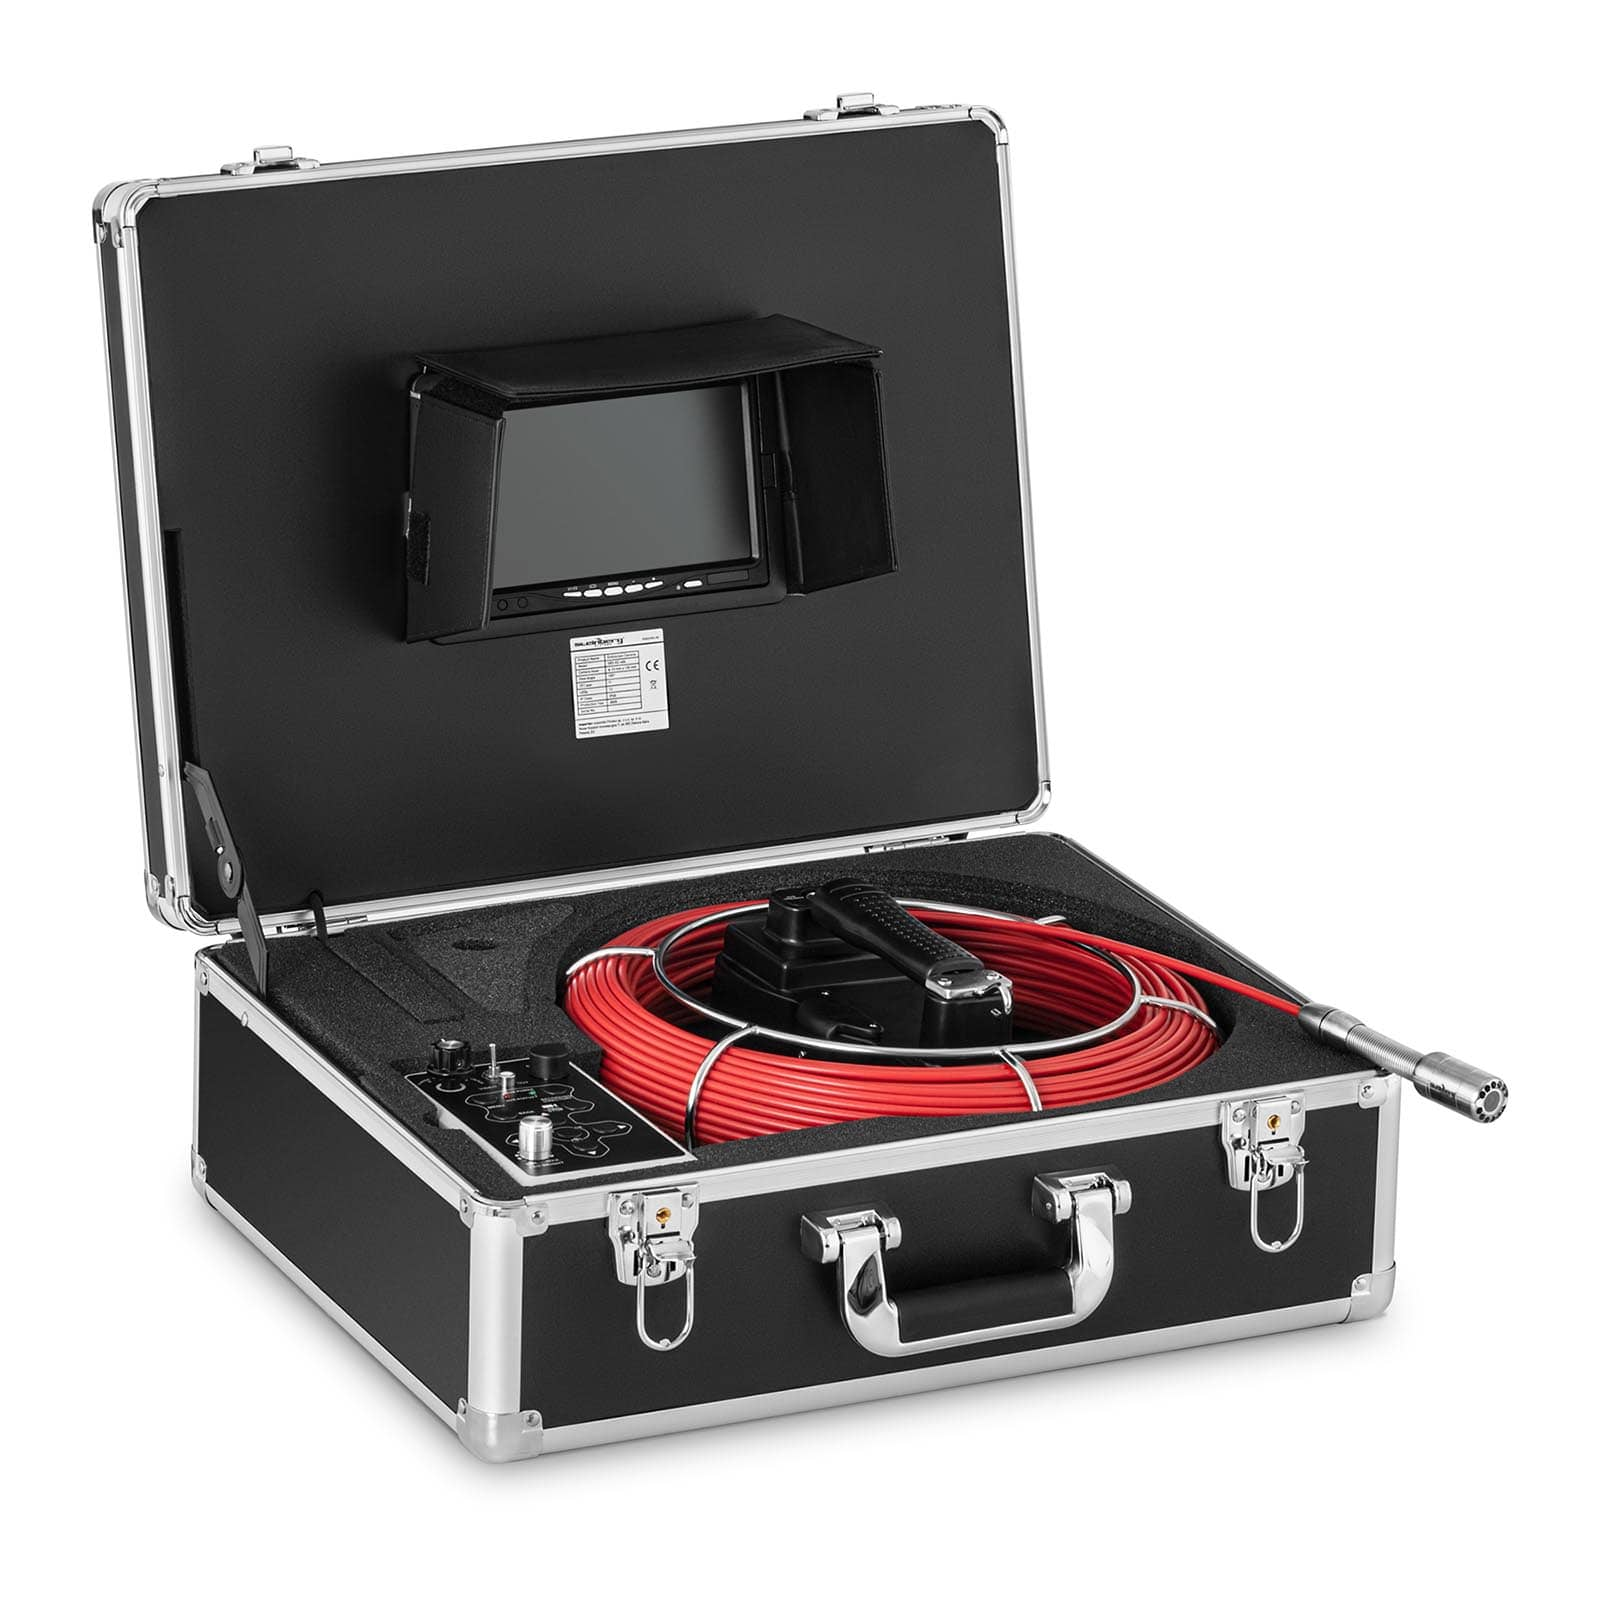 Endoskop-Kameras